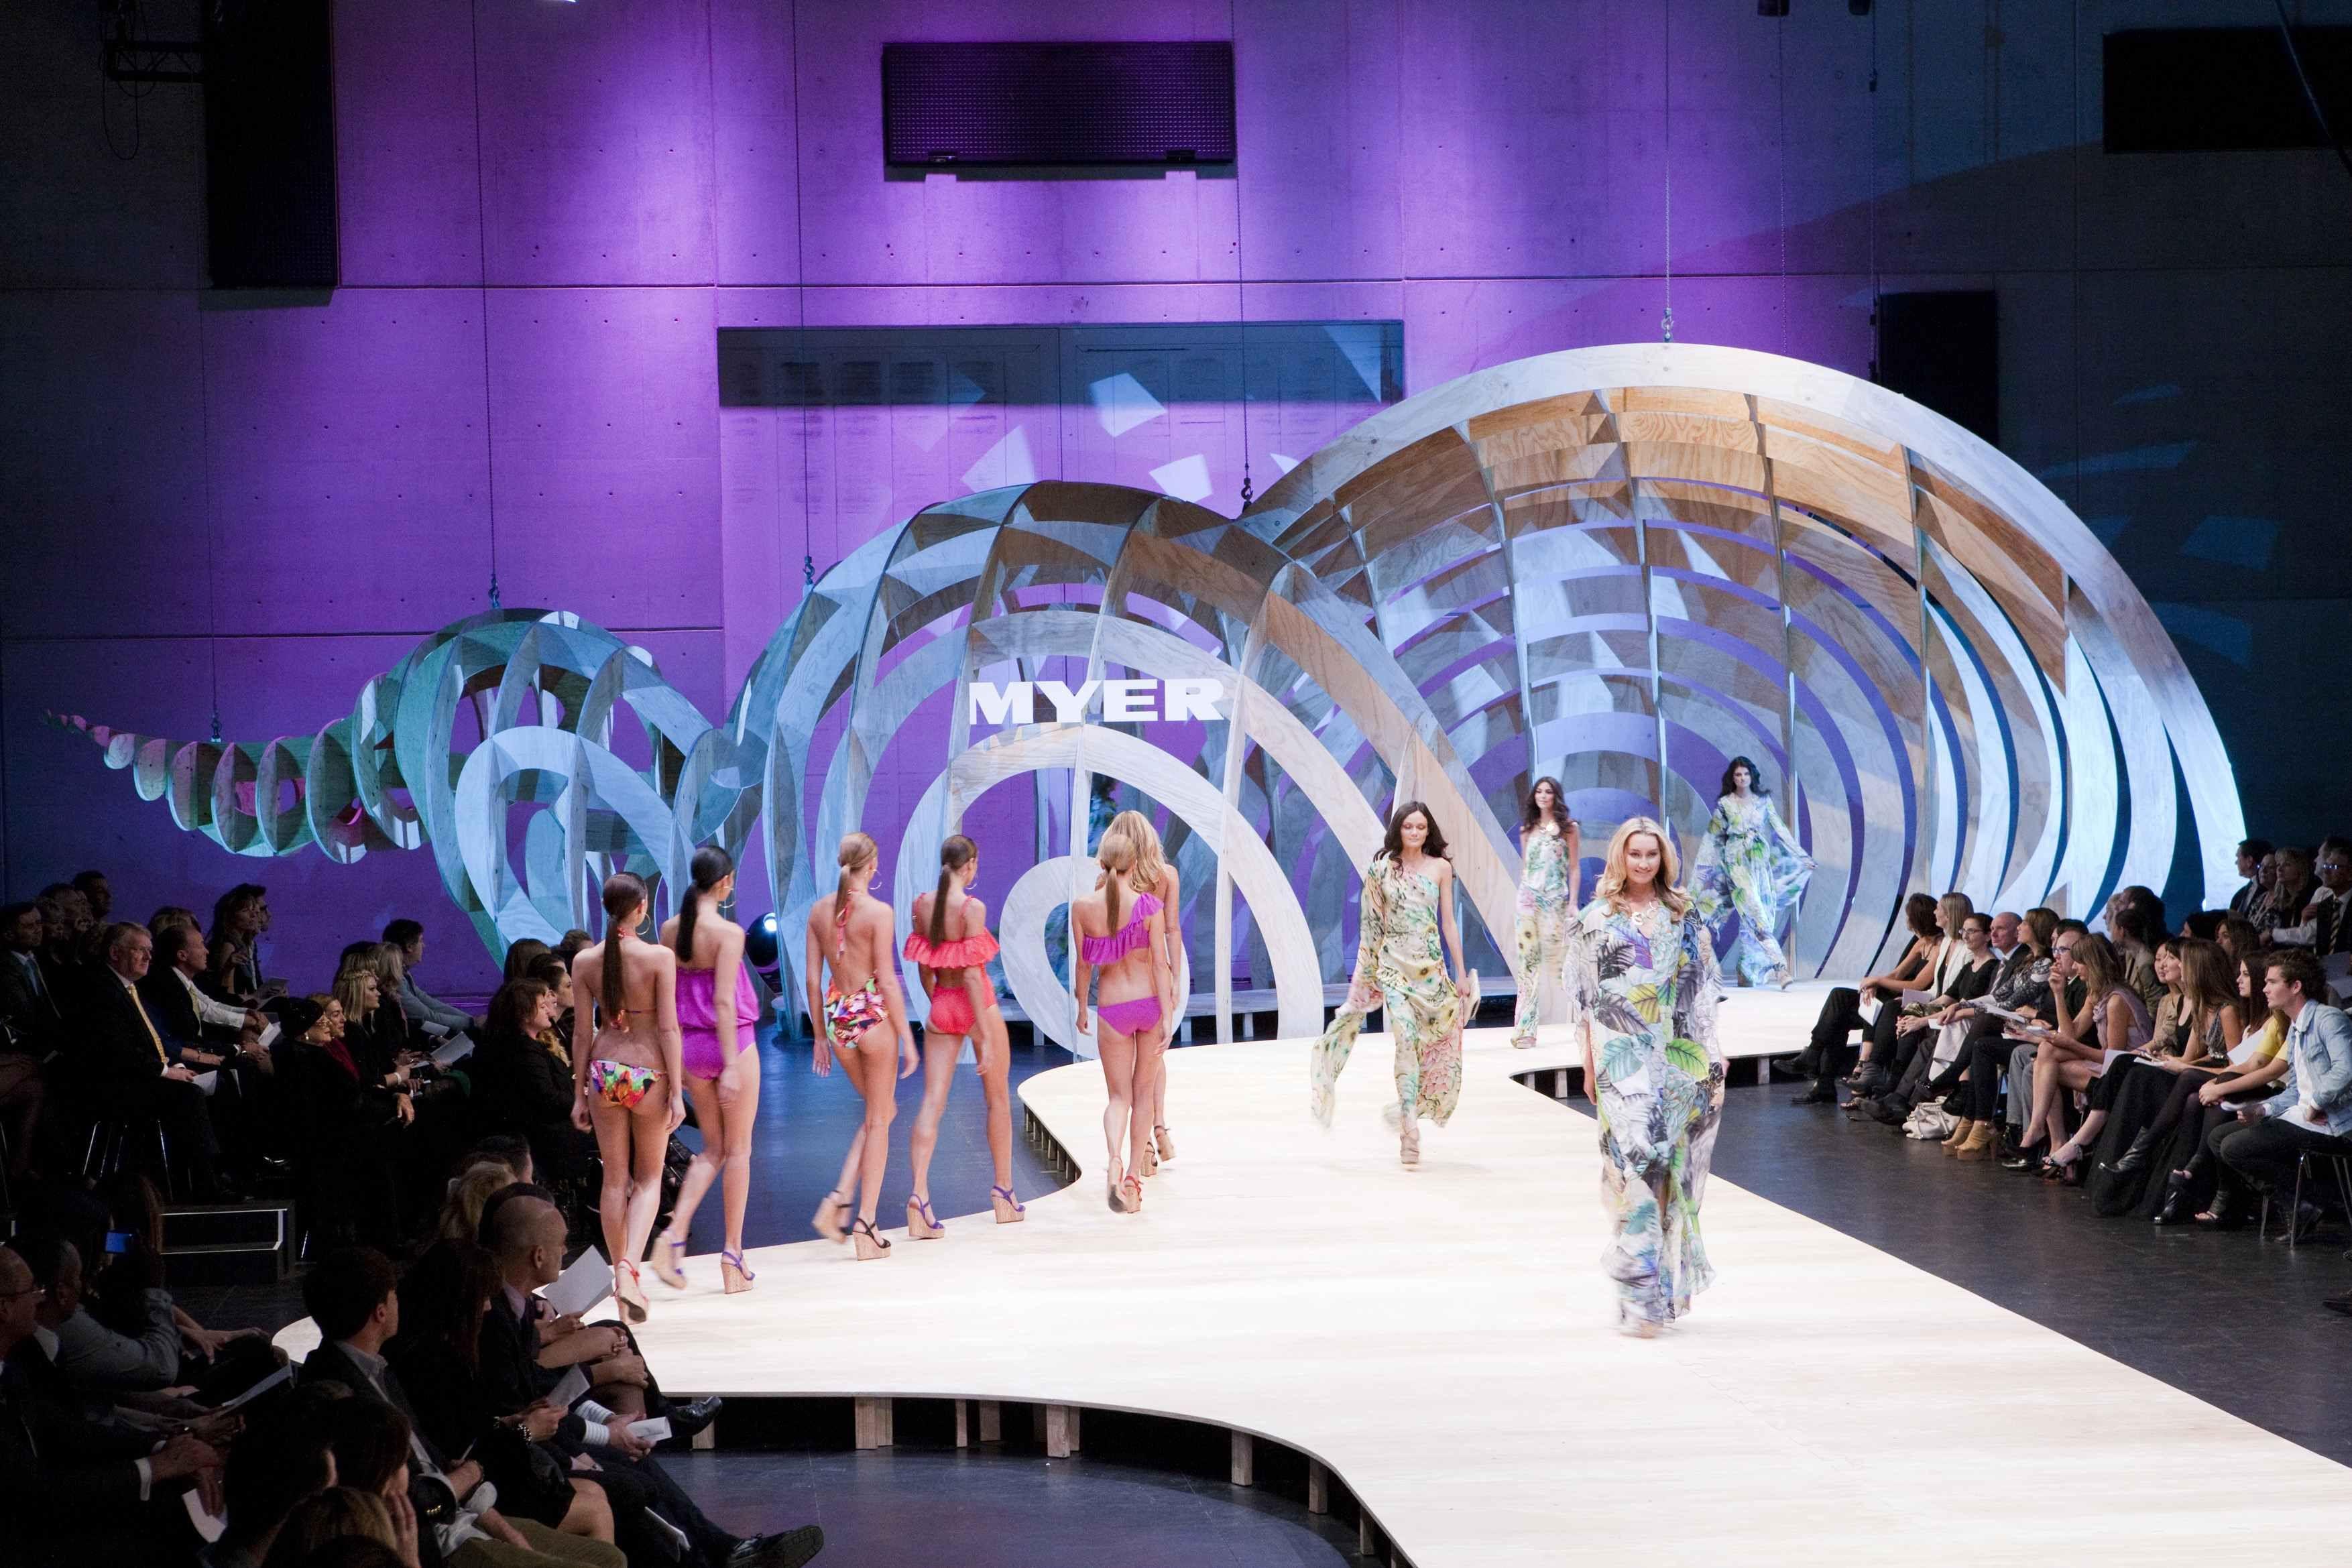 Fashion Show Party Decorations